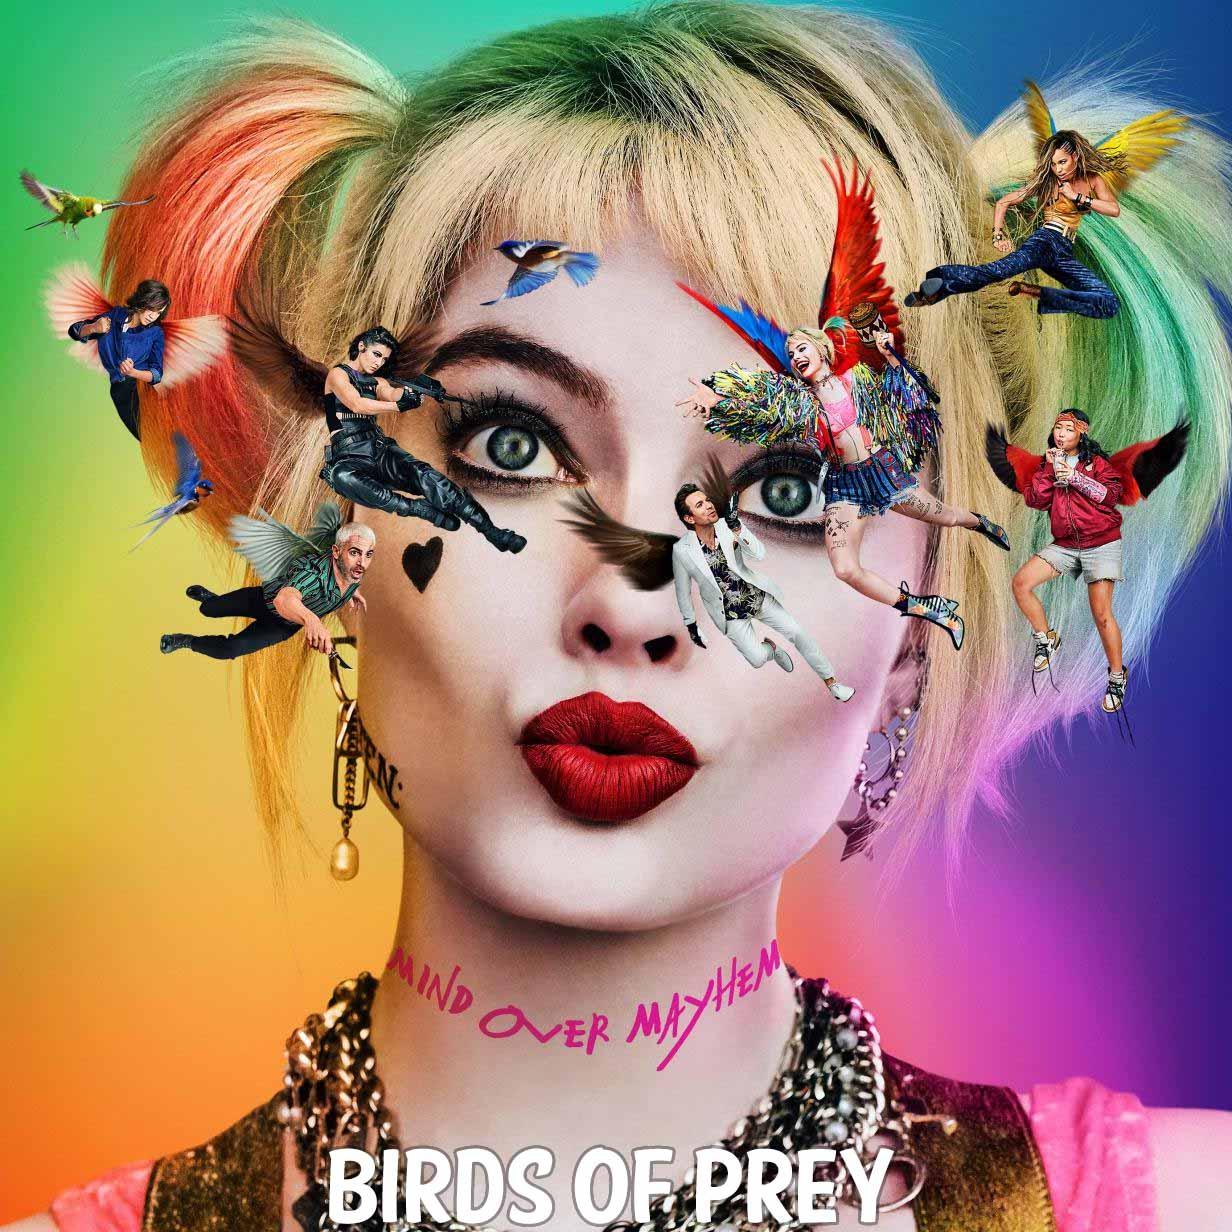 Birds Of Prey Full Hd Movie Download 2020 {Hindi-English} -Tamilrockers